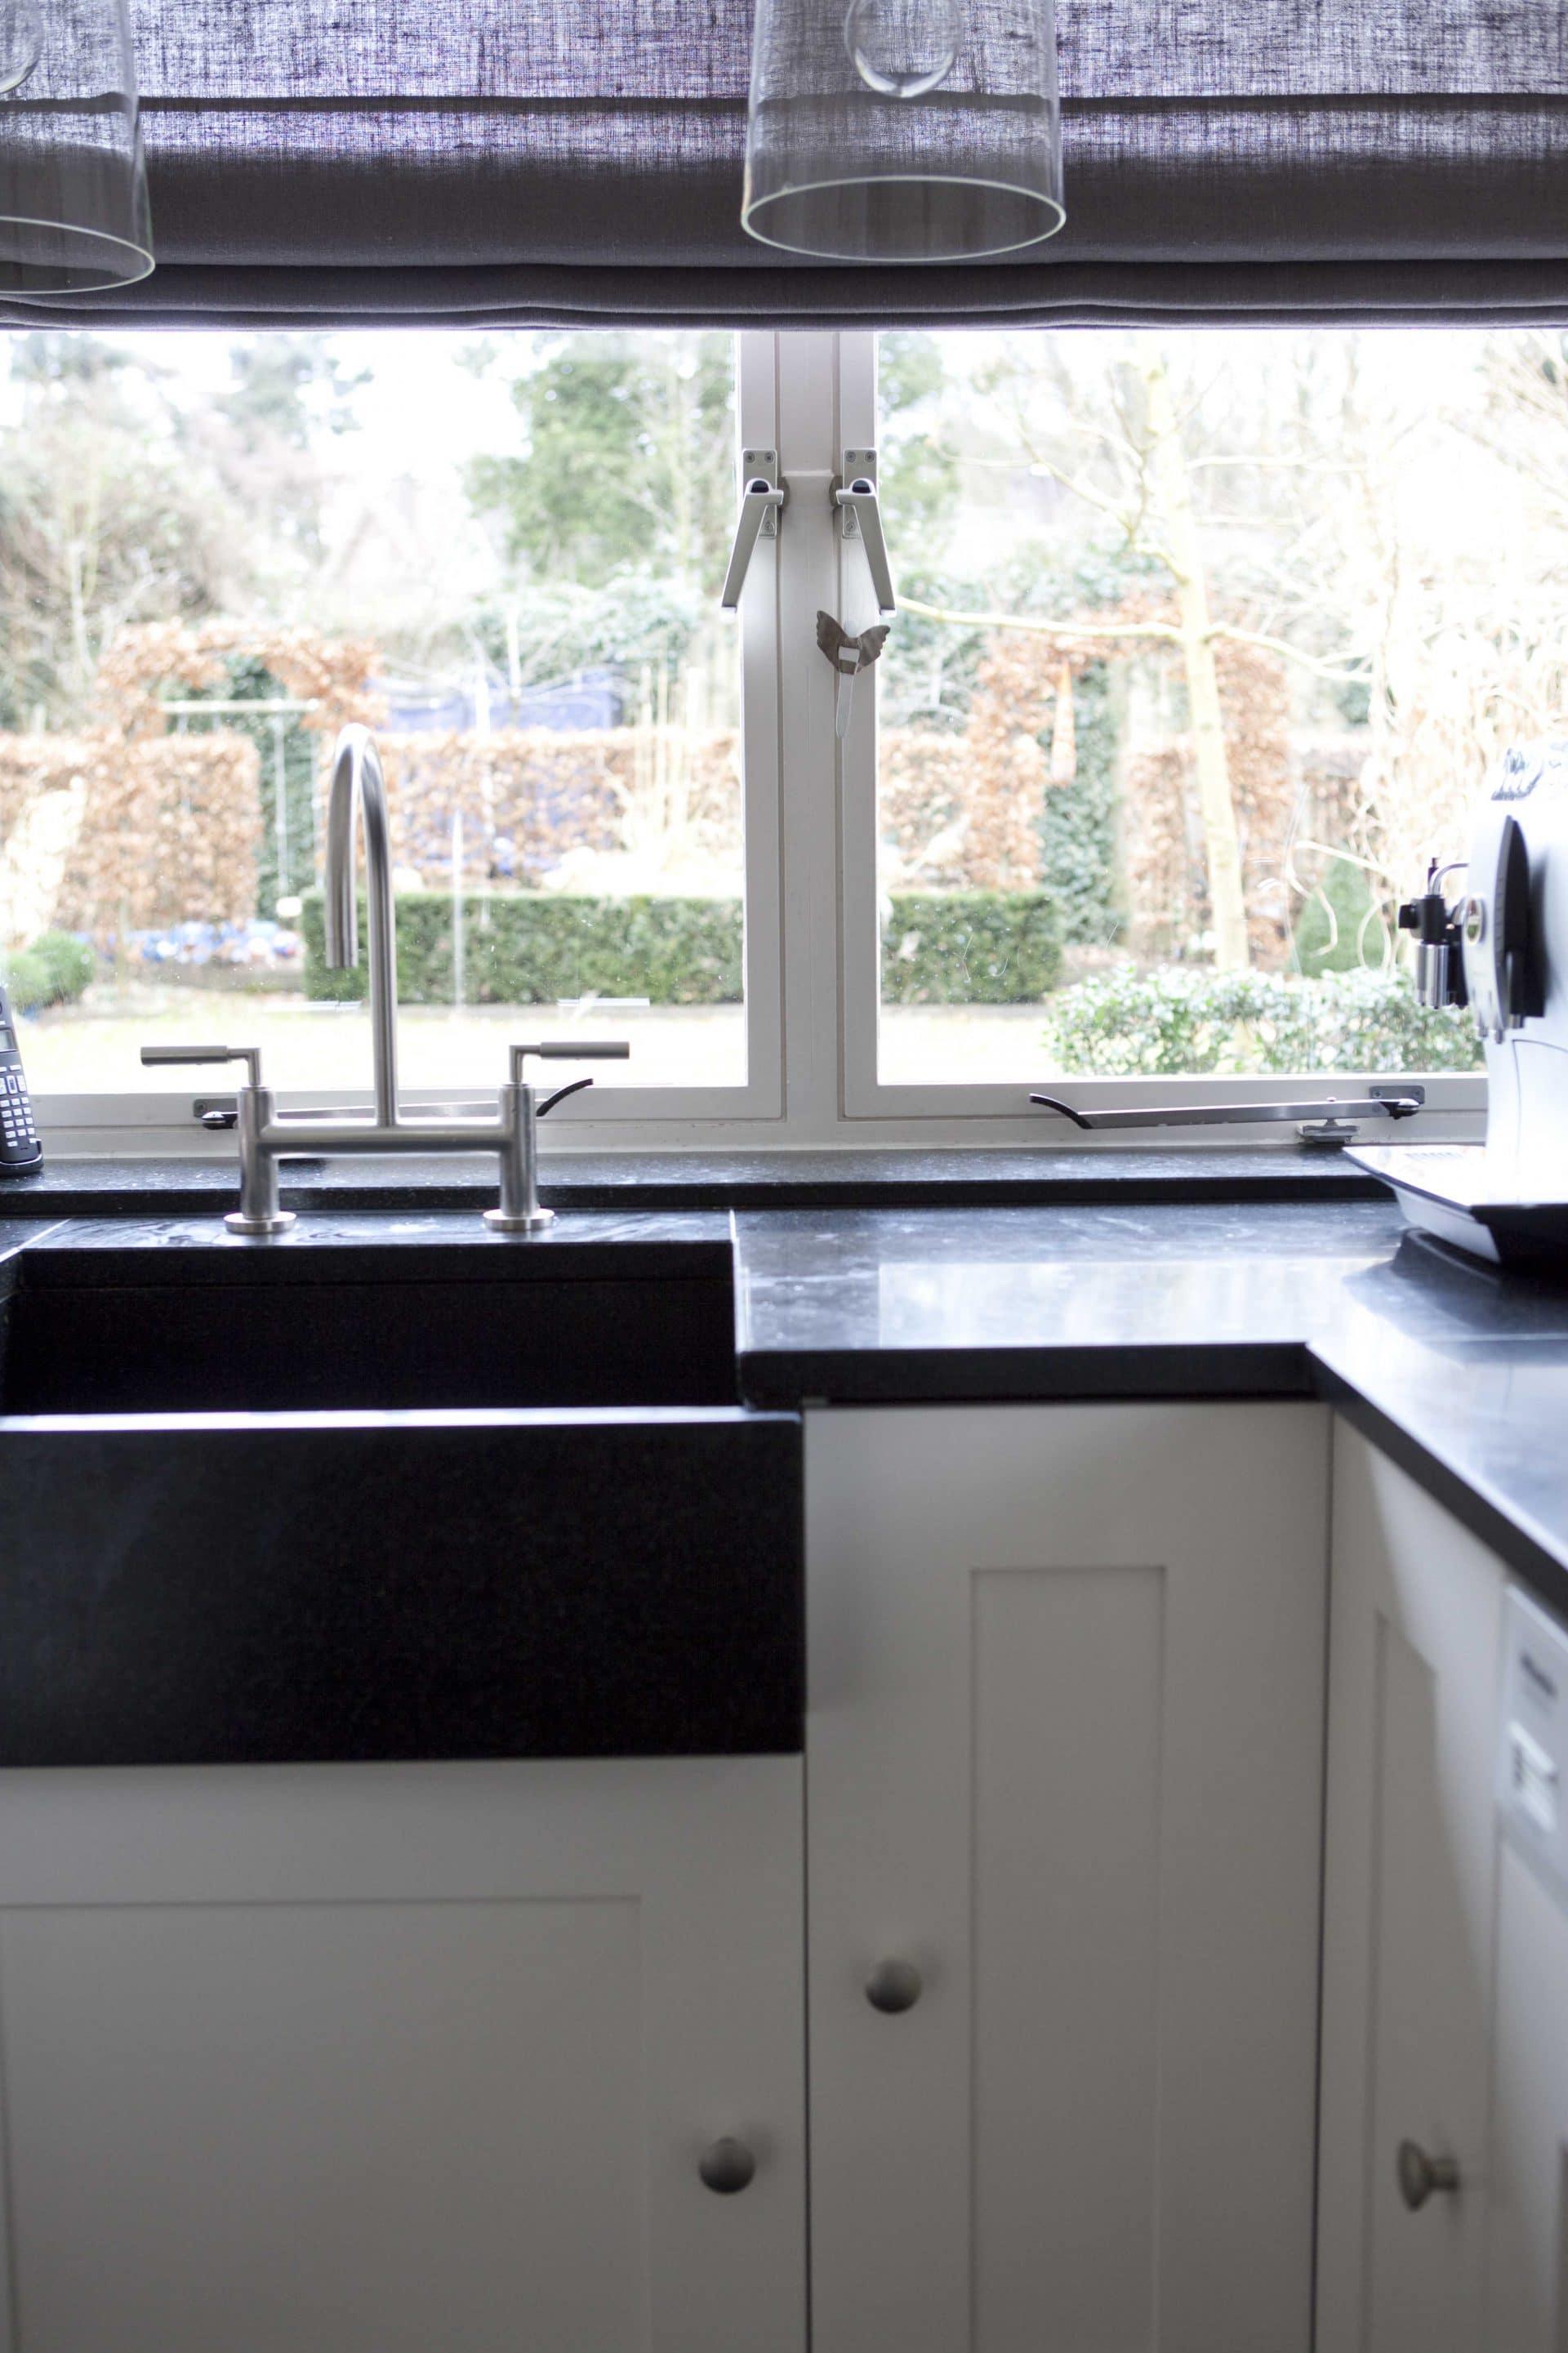 keuken detail verlaagde natuursteen spoelbak